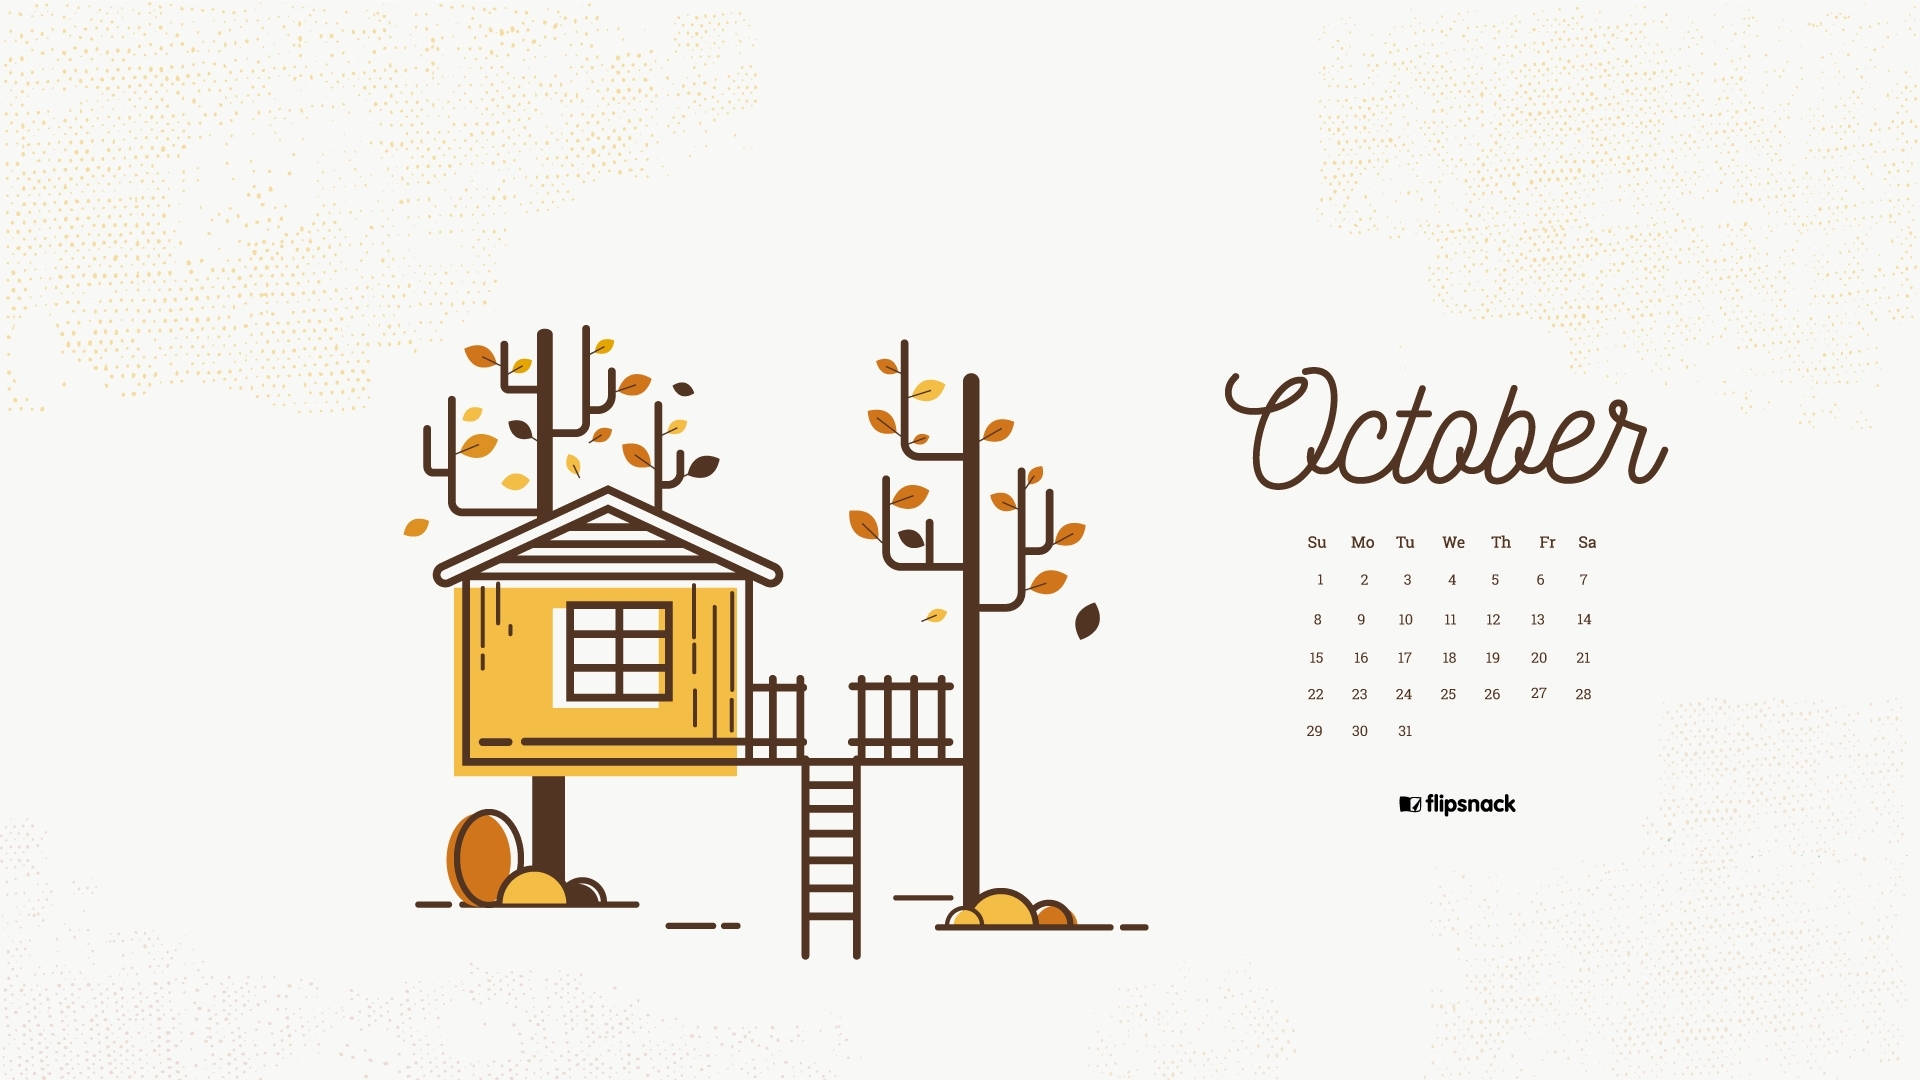 october 2017 calendar wallpaper for desktop background